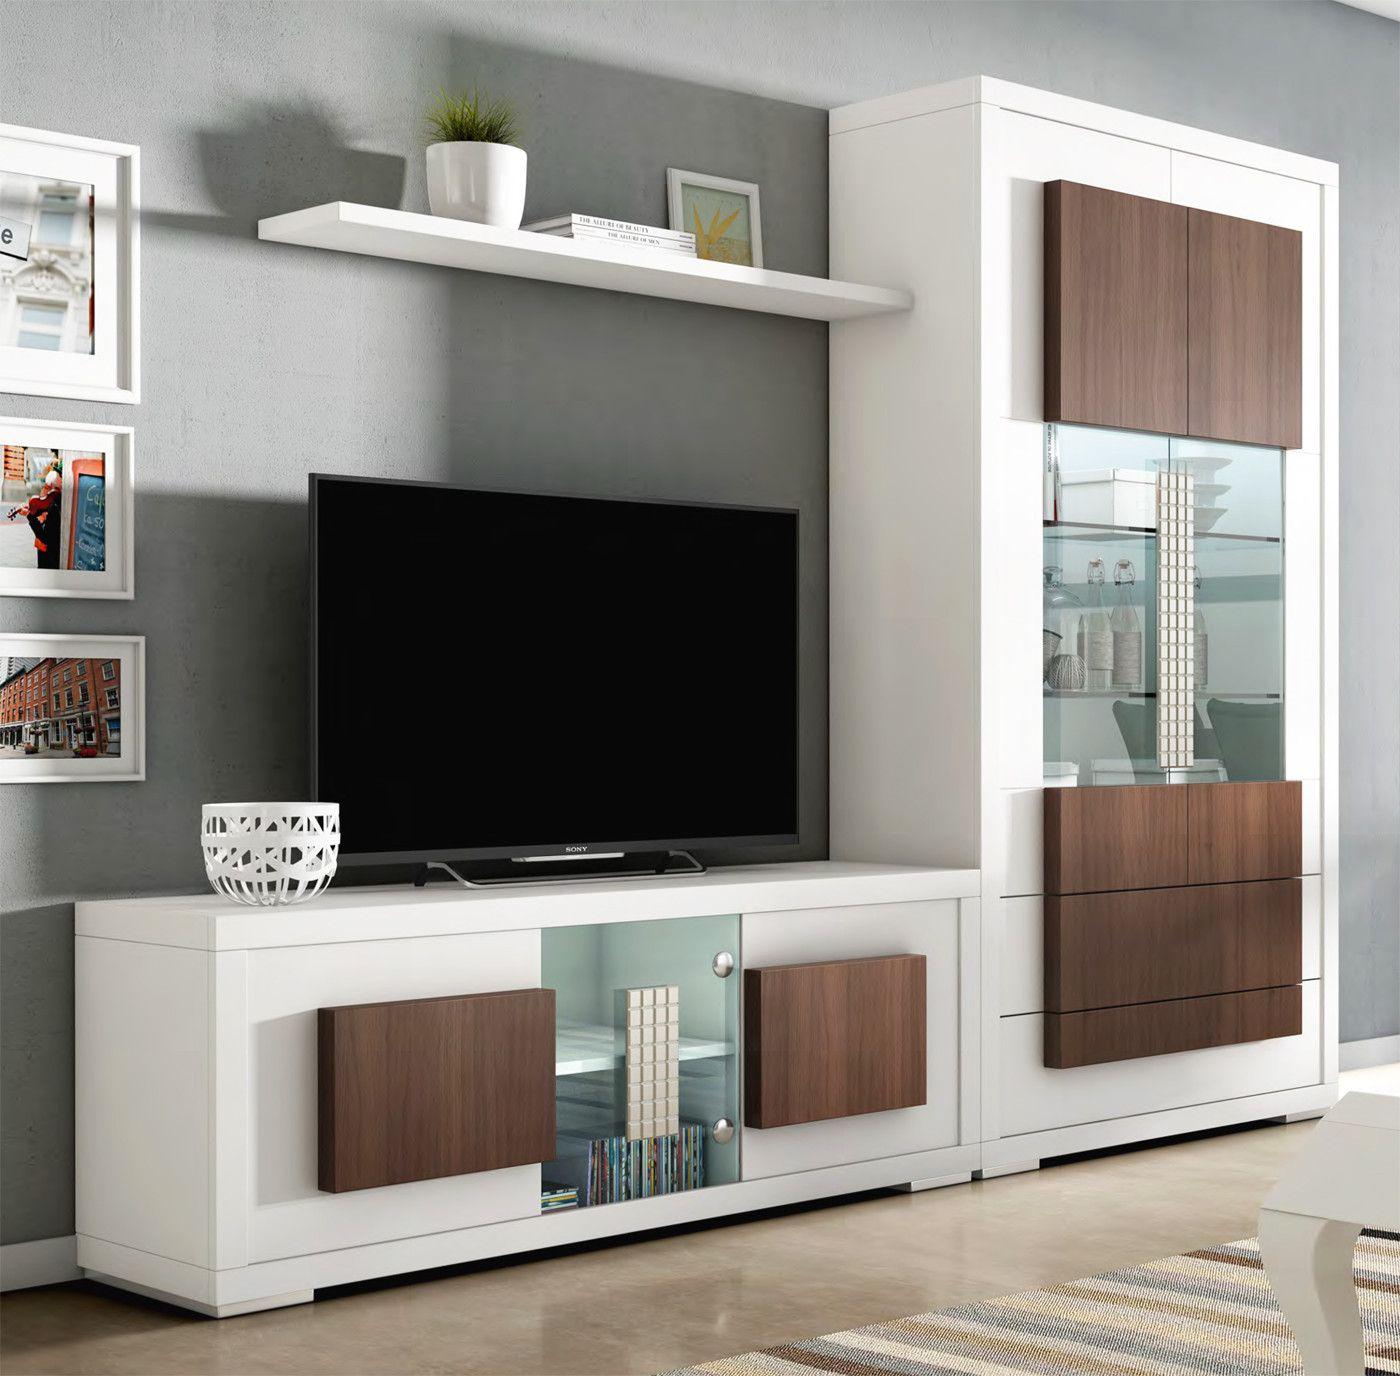 Muebles de sal n de dise o con vitrina y mesa tv madera en for Muebles para television de madera modernos